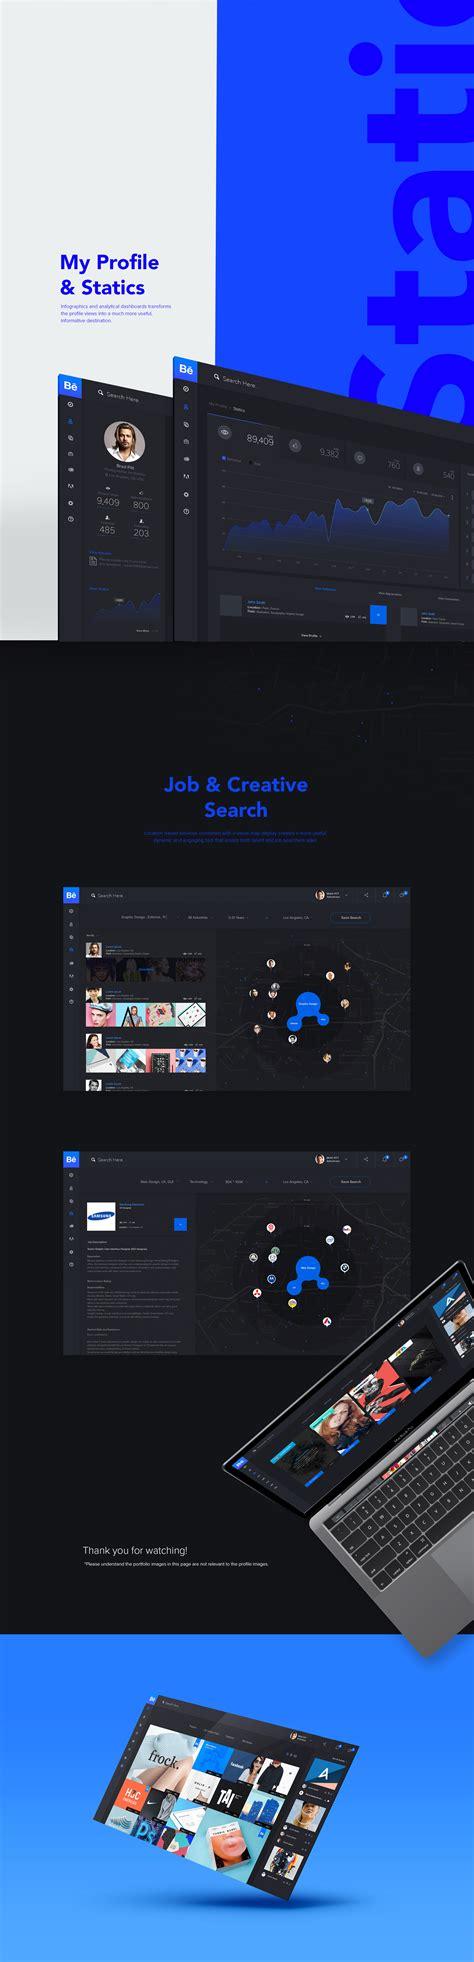 design app desktop interaction design behance desktop app concept